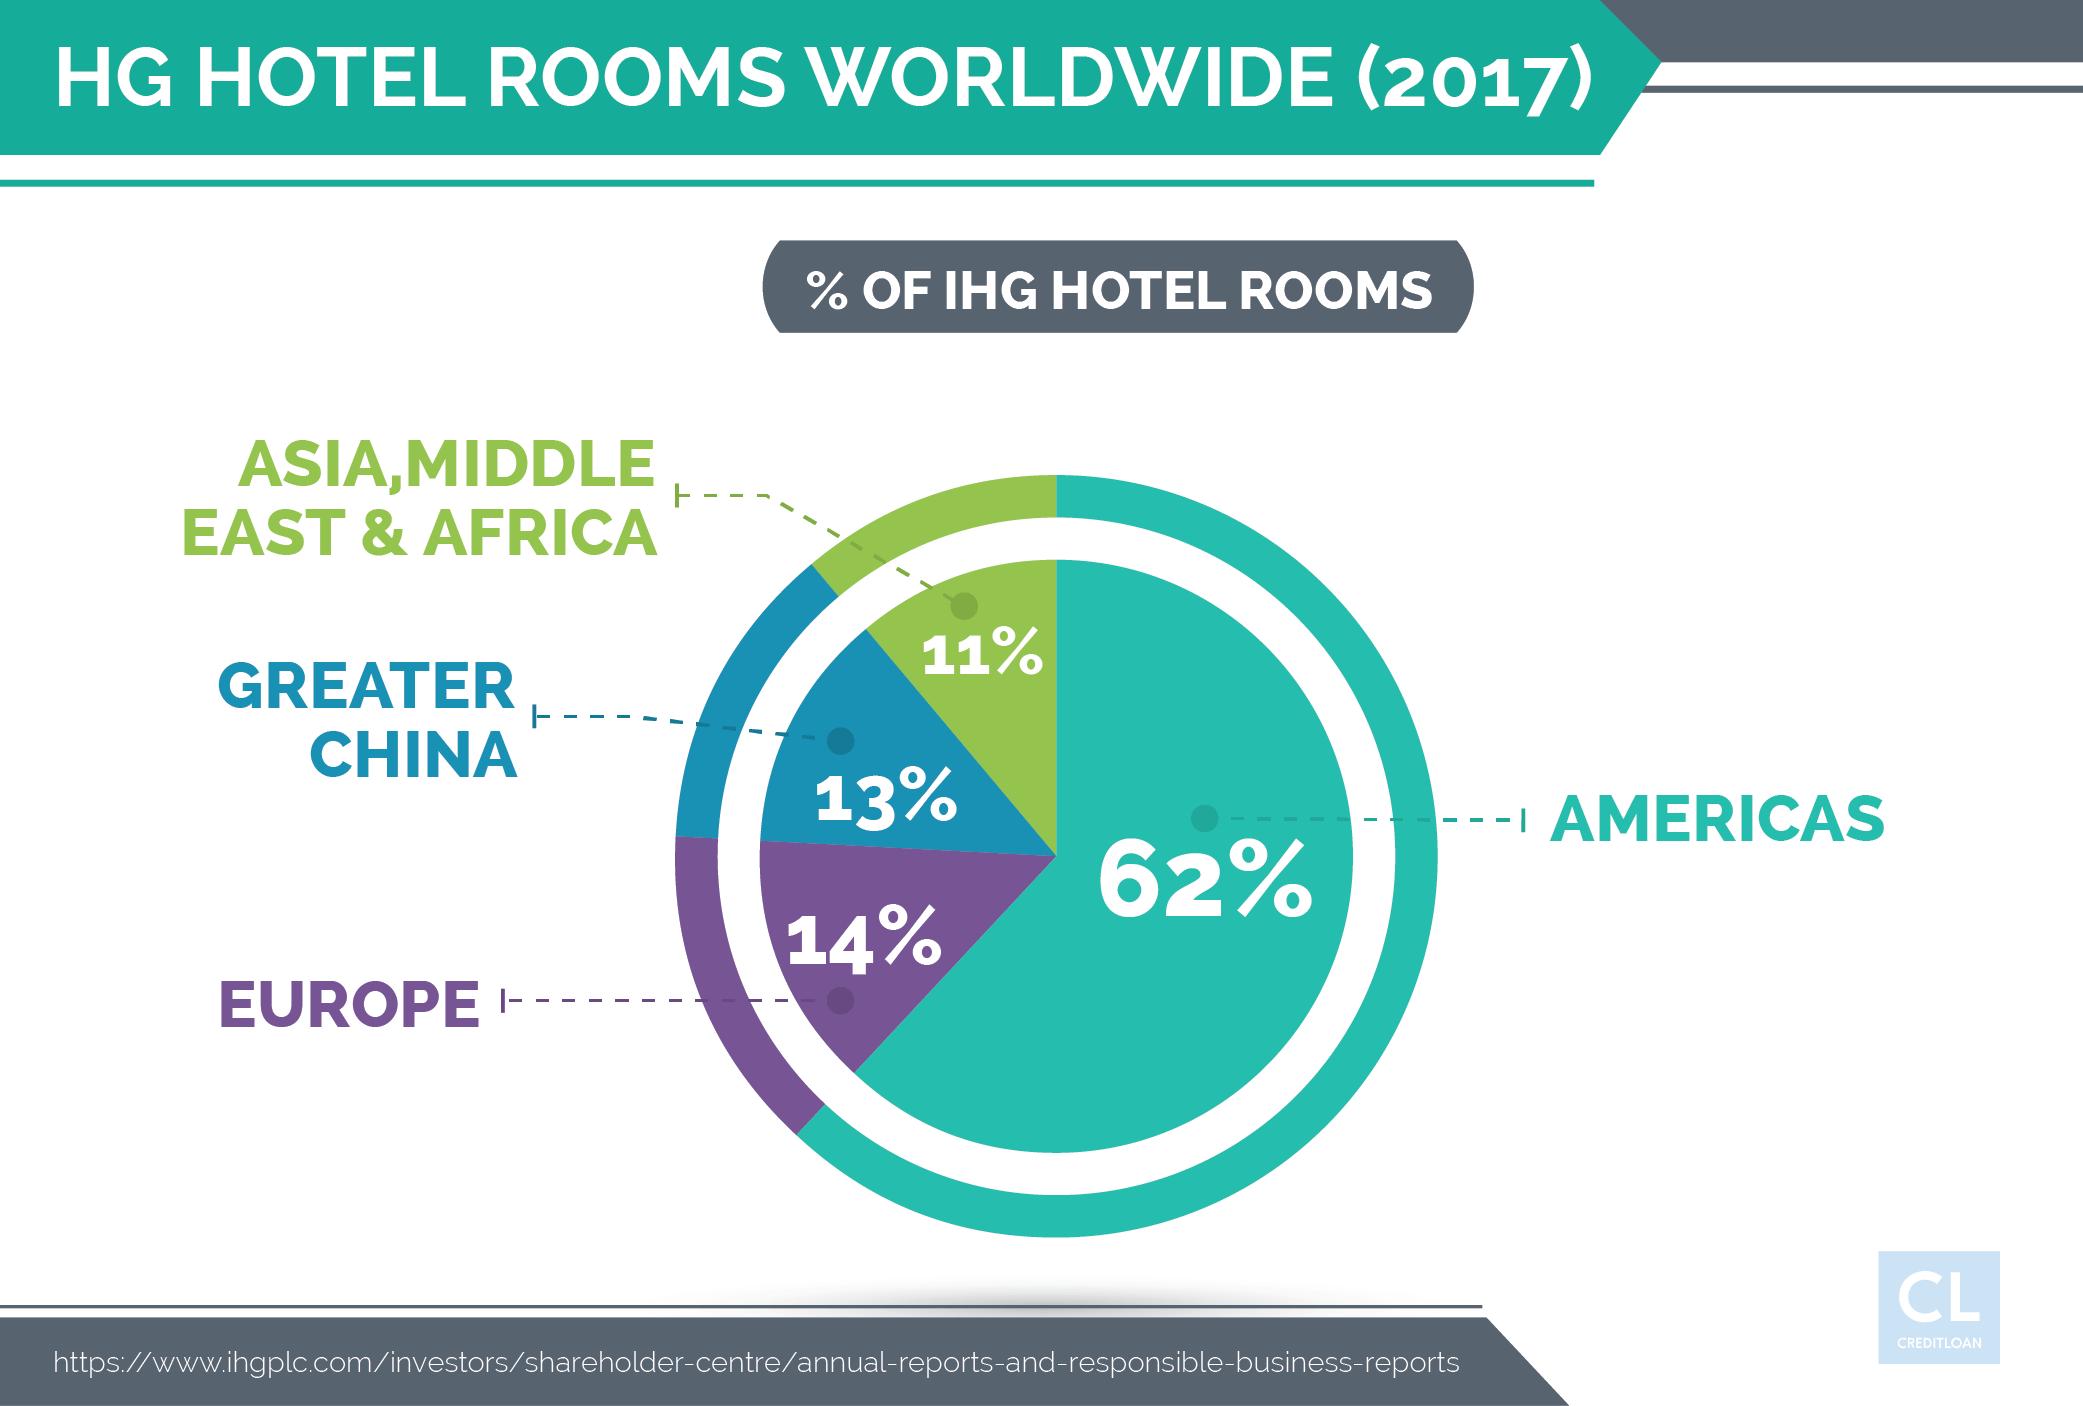 IHG Hotel Rooms Worldwide